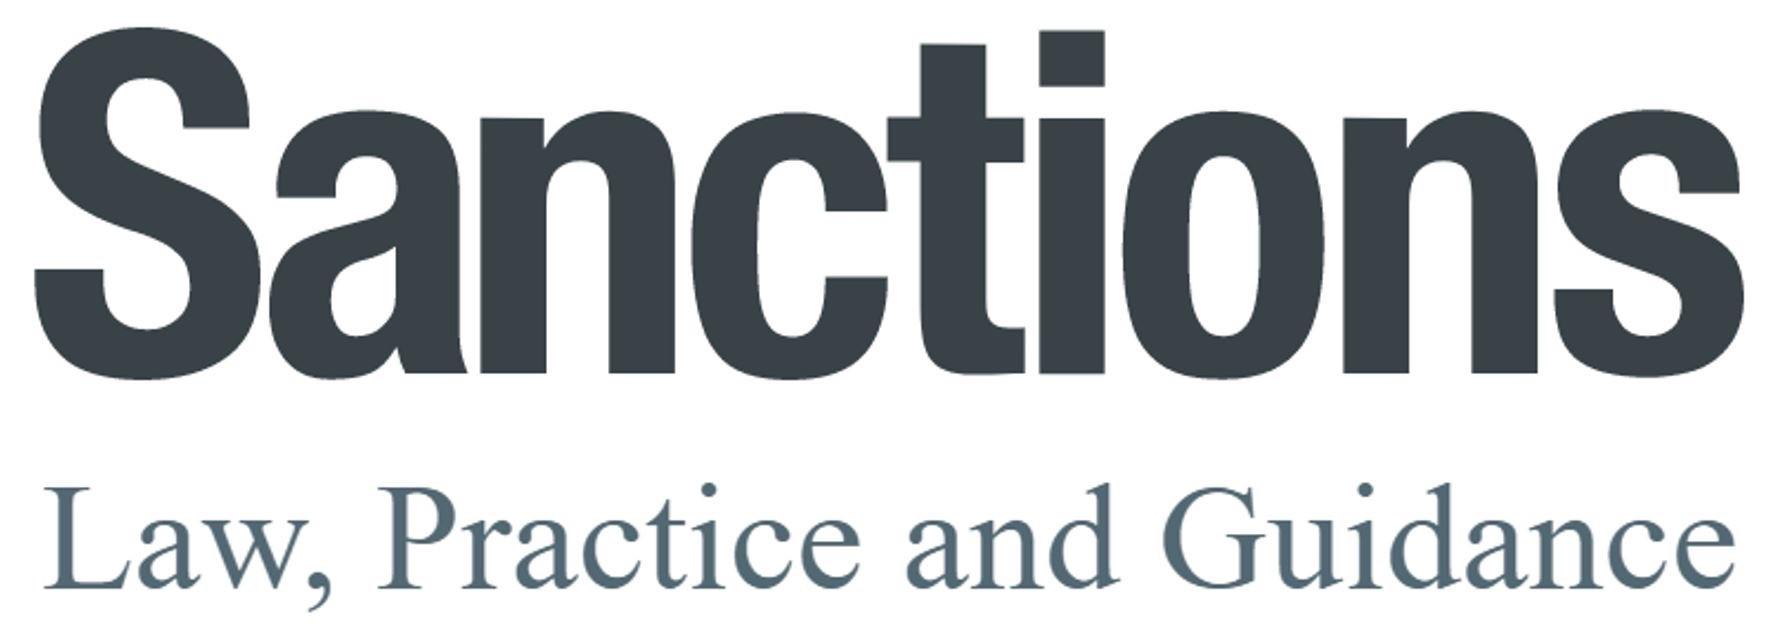 EU Sanctions logo